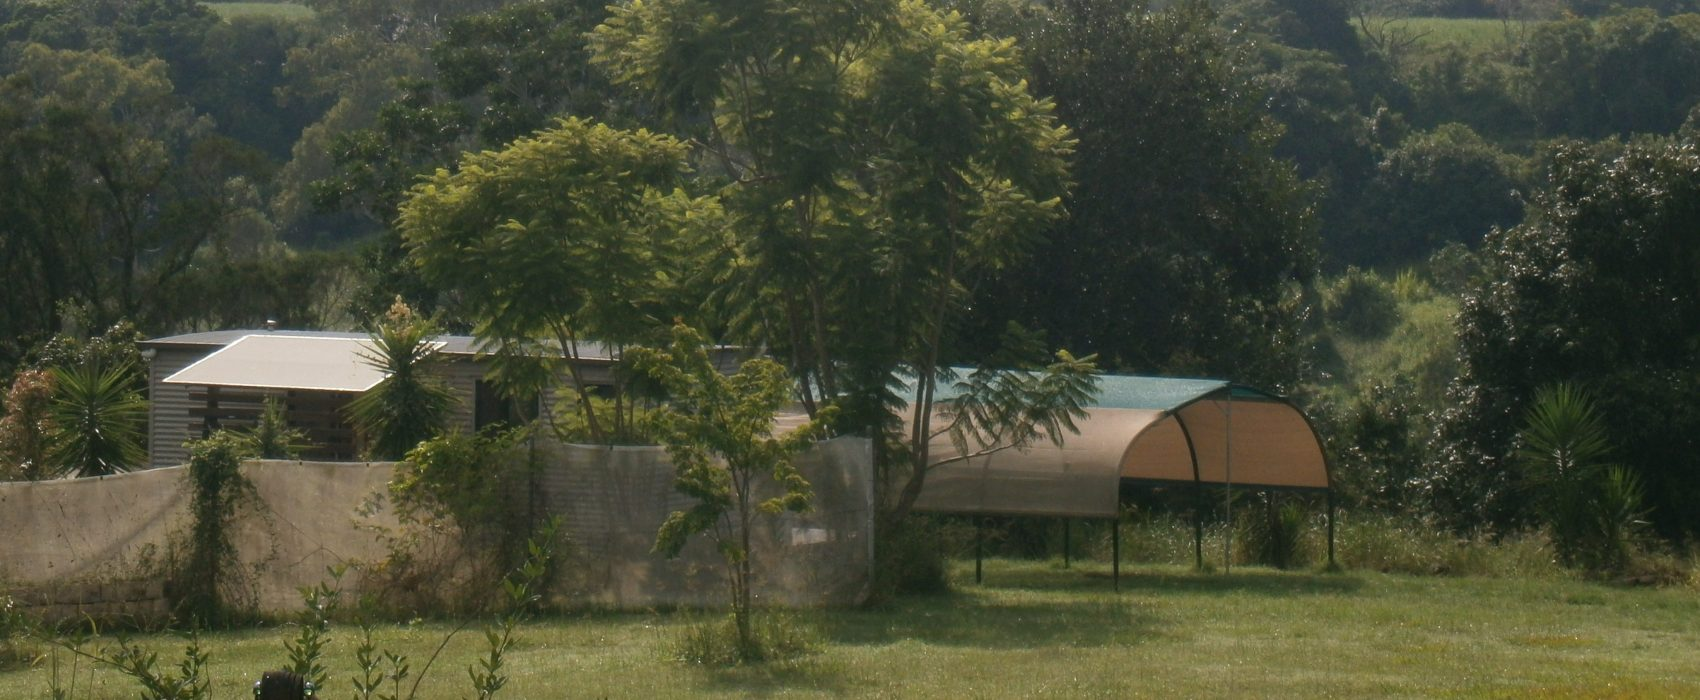 shady carport and cabin